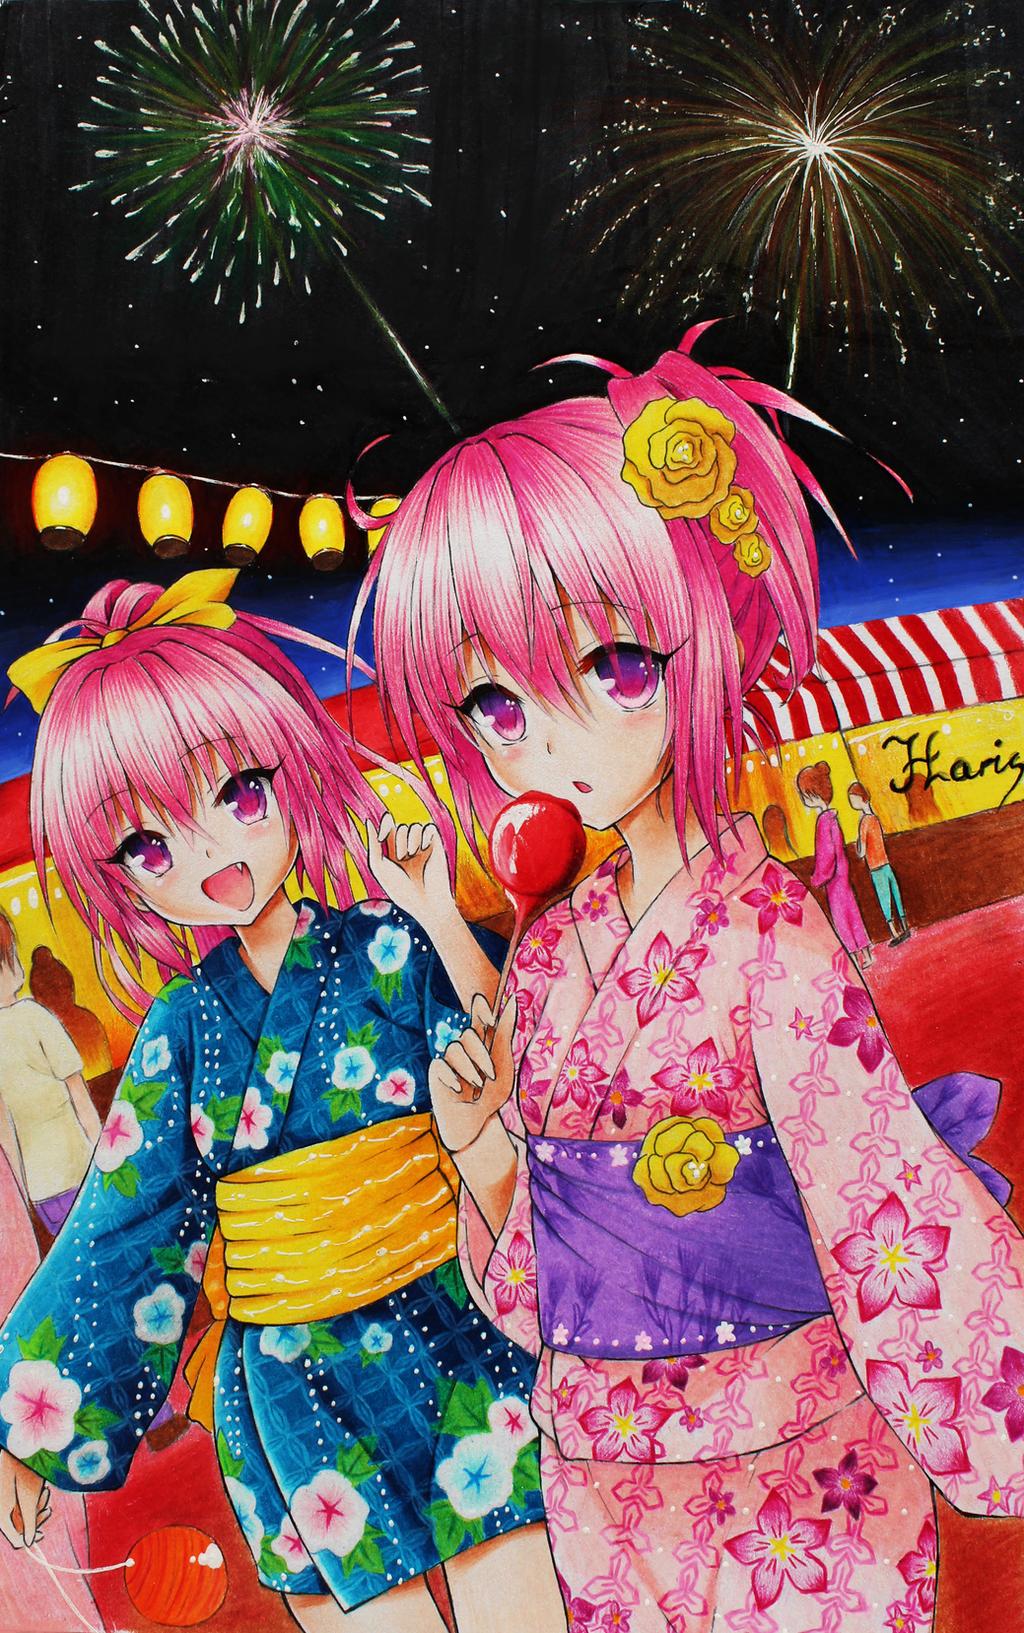 Festival Fireworks By Pademo